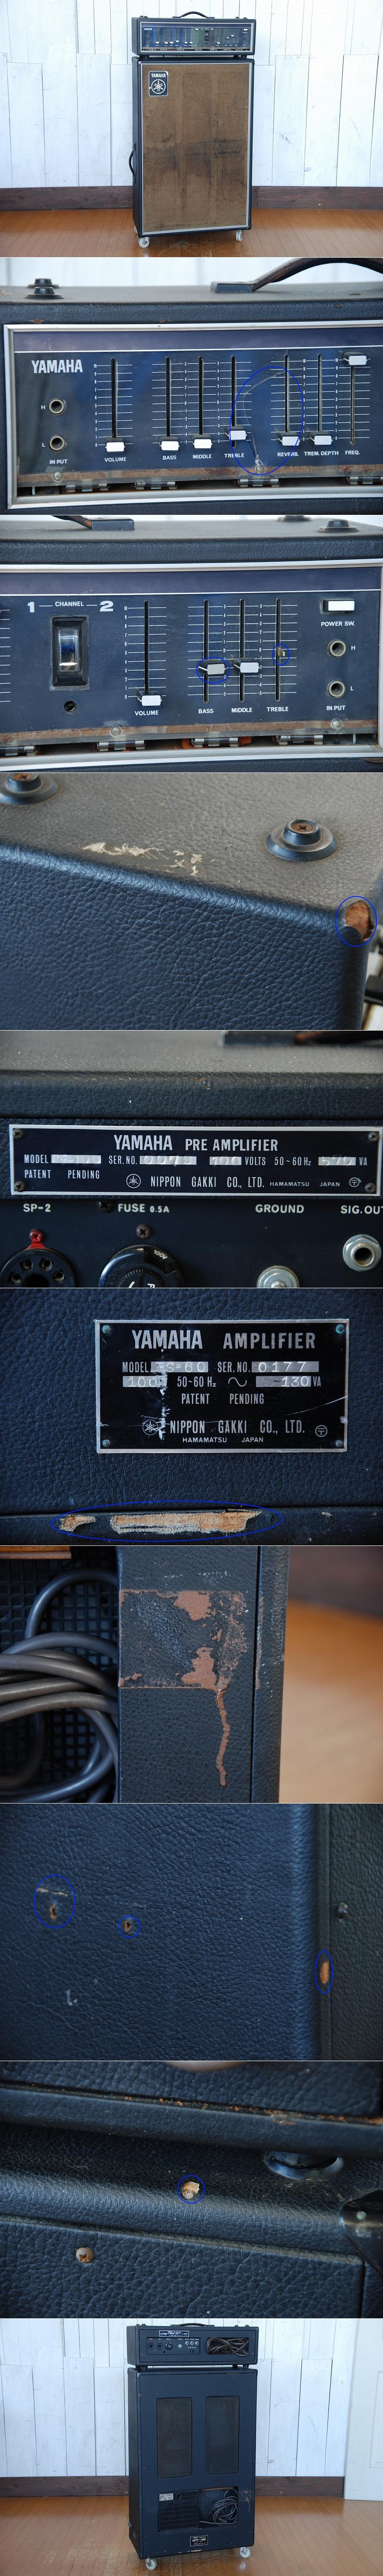 YAMAHA/ Yamaha / pre * amplifier /PE-100/ amplifier /TS-60/ present